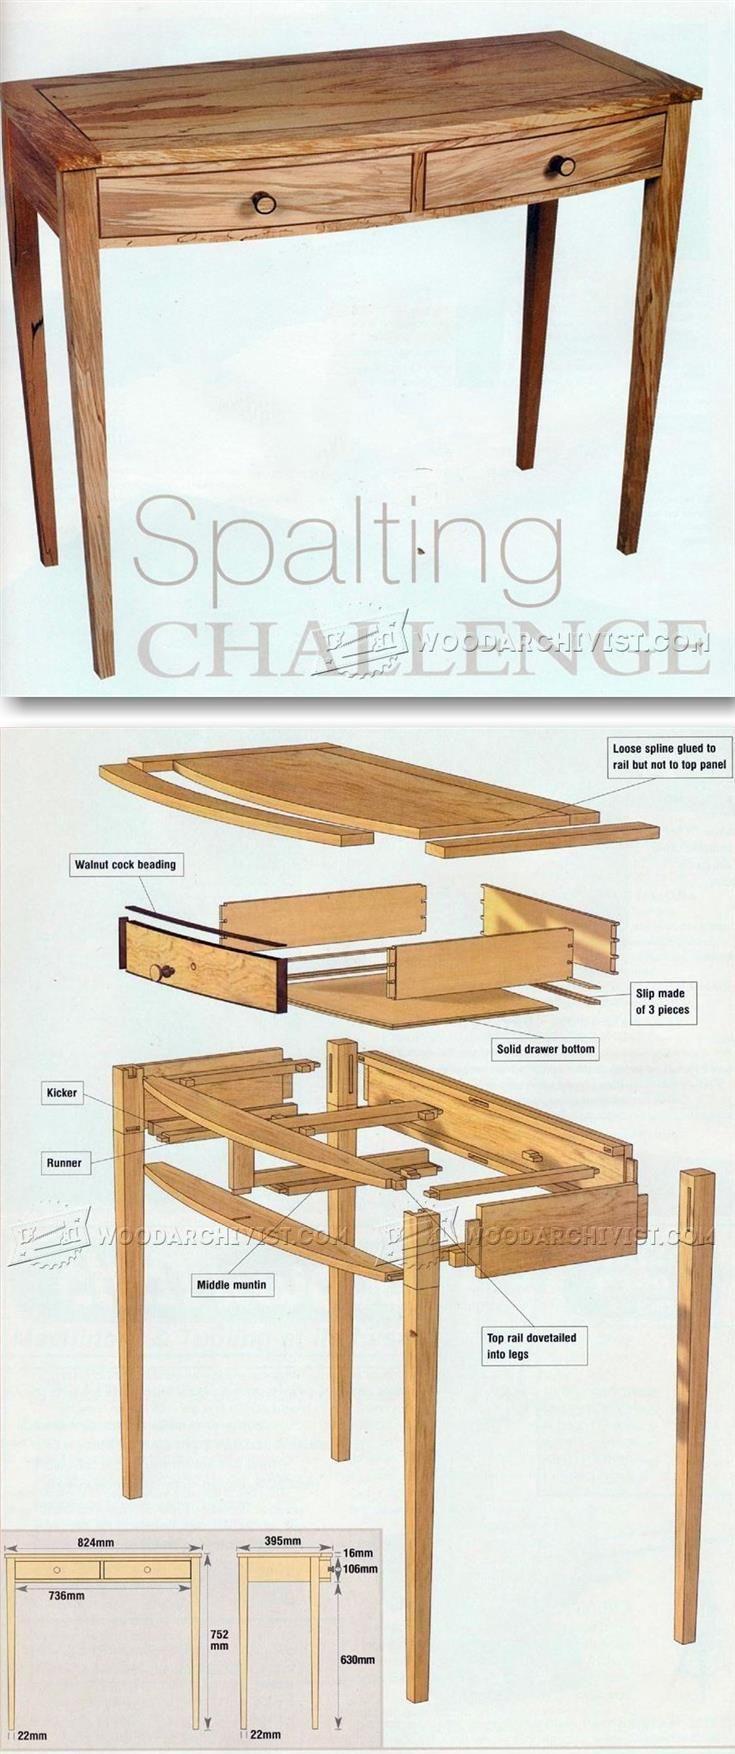 Design homemade dining table plans diy ideas 187 woodplans woodplans - Side Table Plan Furniture Plans And Projects Woodwork Woodworking Woodworking Plans Woodworking Projects Woodworking With Easy